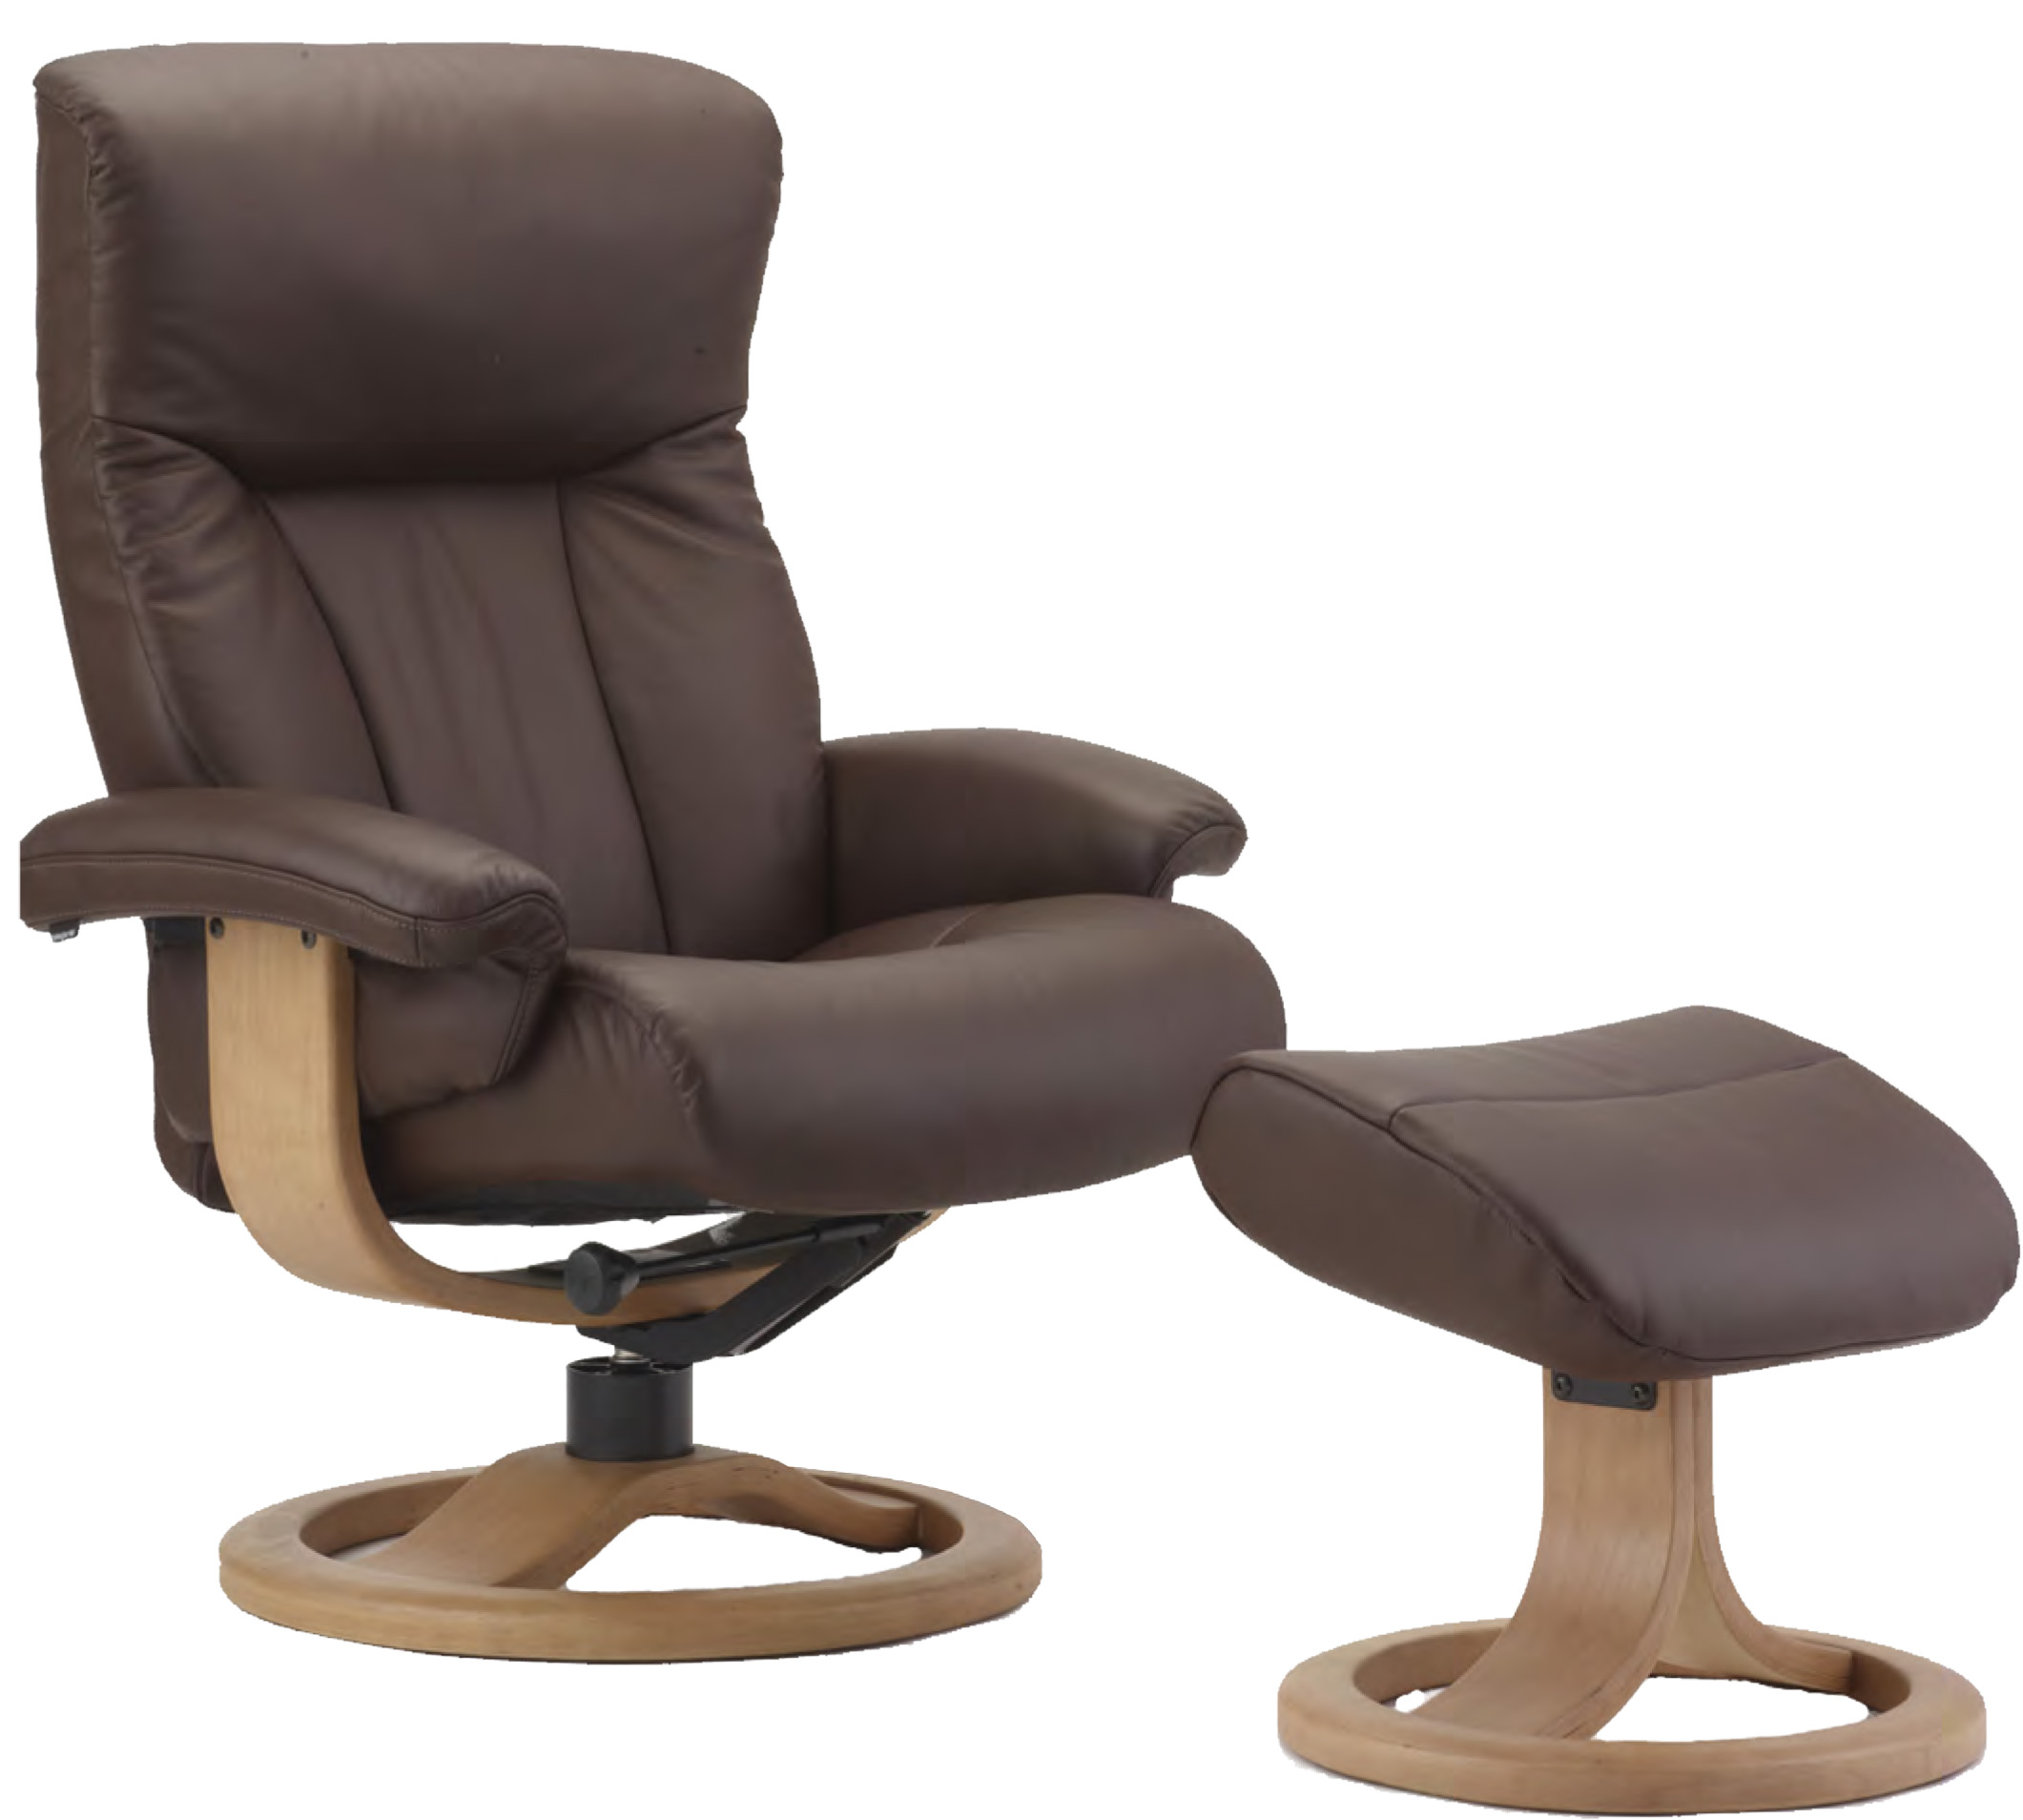 ergonomic recliner chair task lumbar support fjords scandic leather 43 ottoman